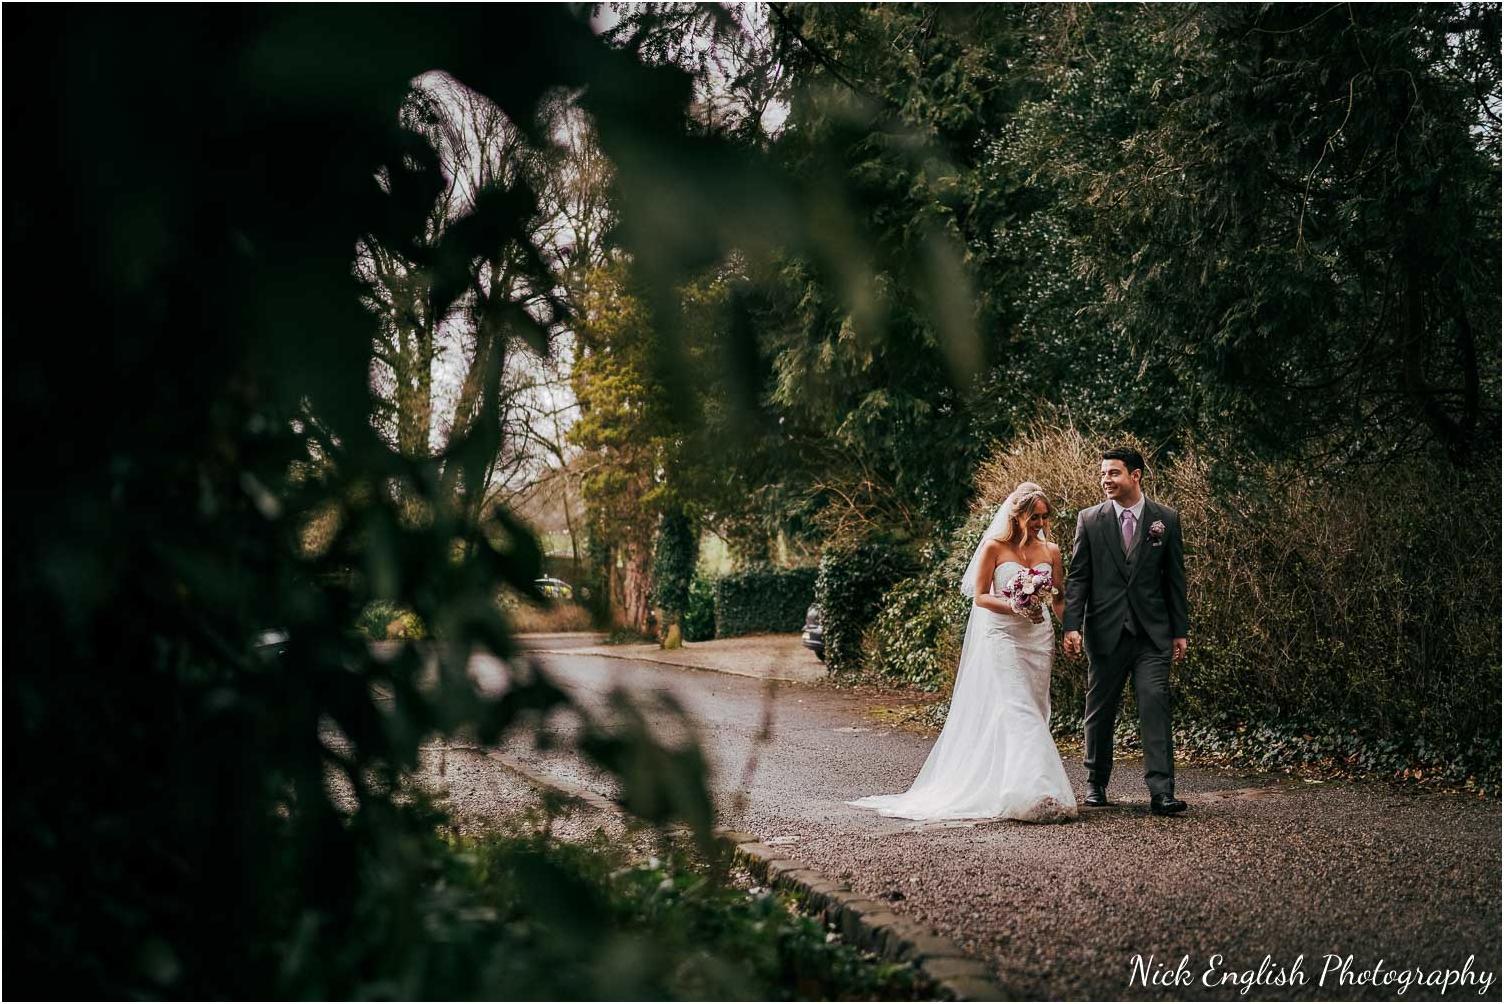 Mitton_Hall_Wedding_Photographer_2018-116.jpg